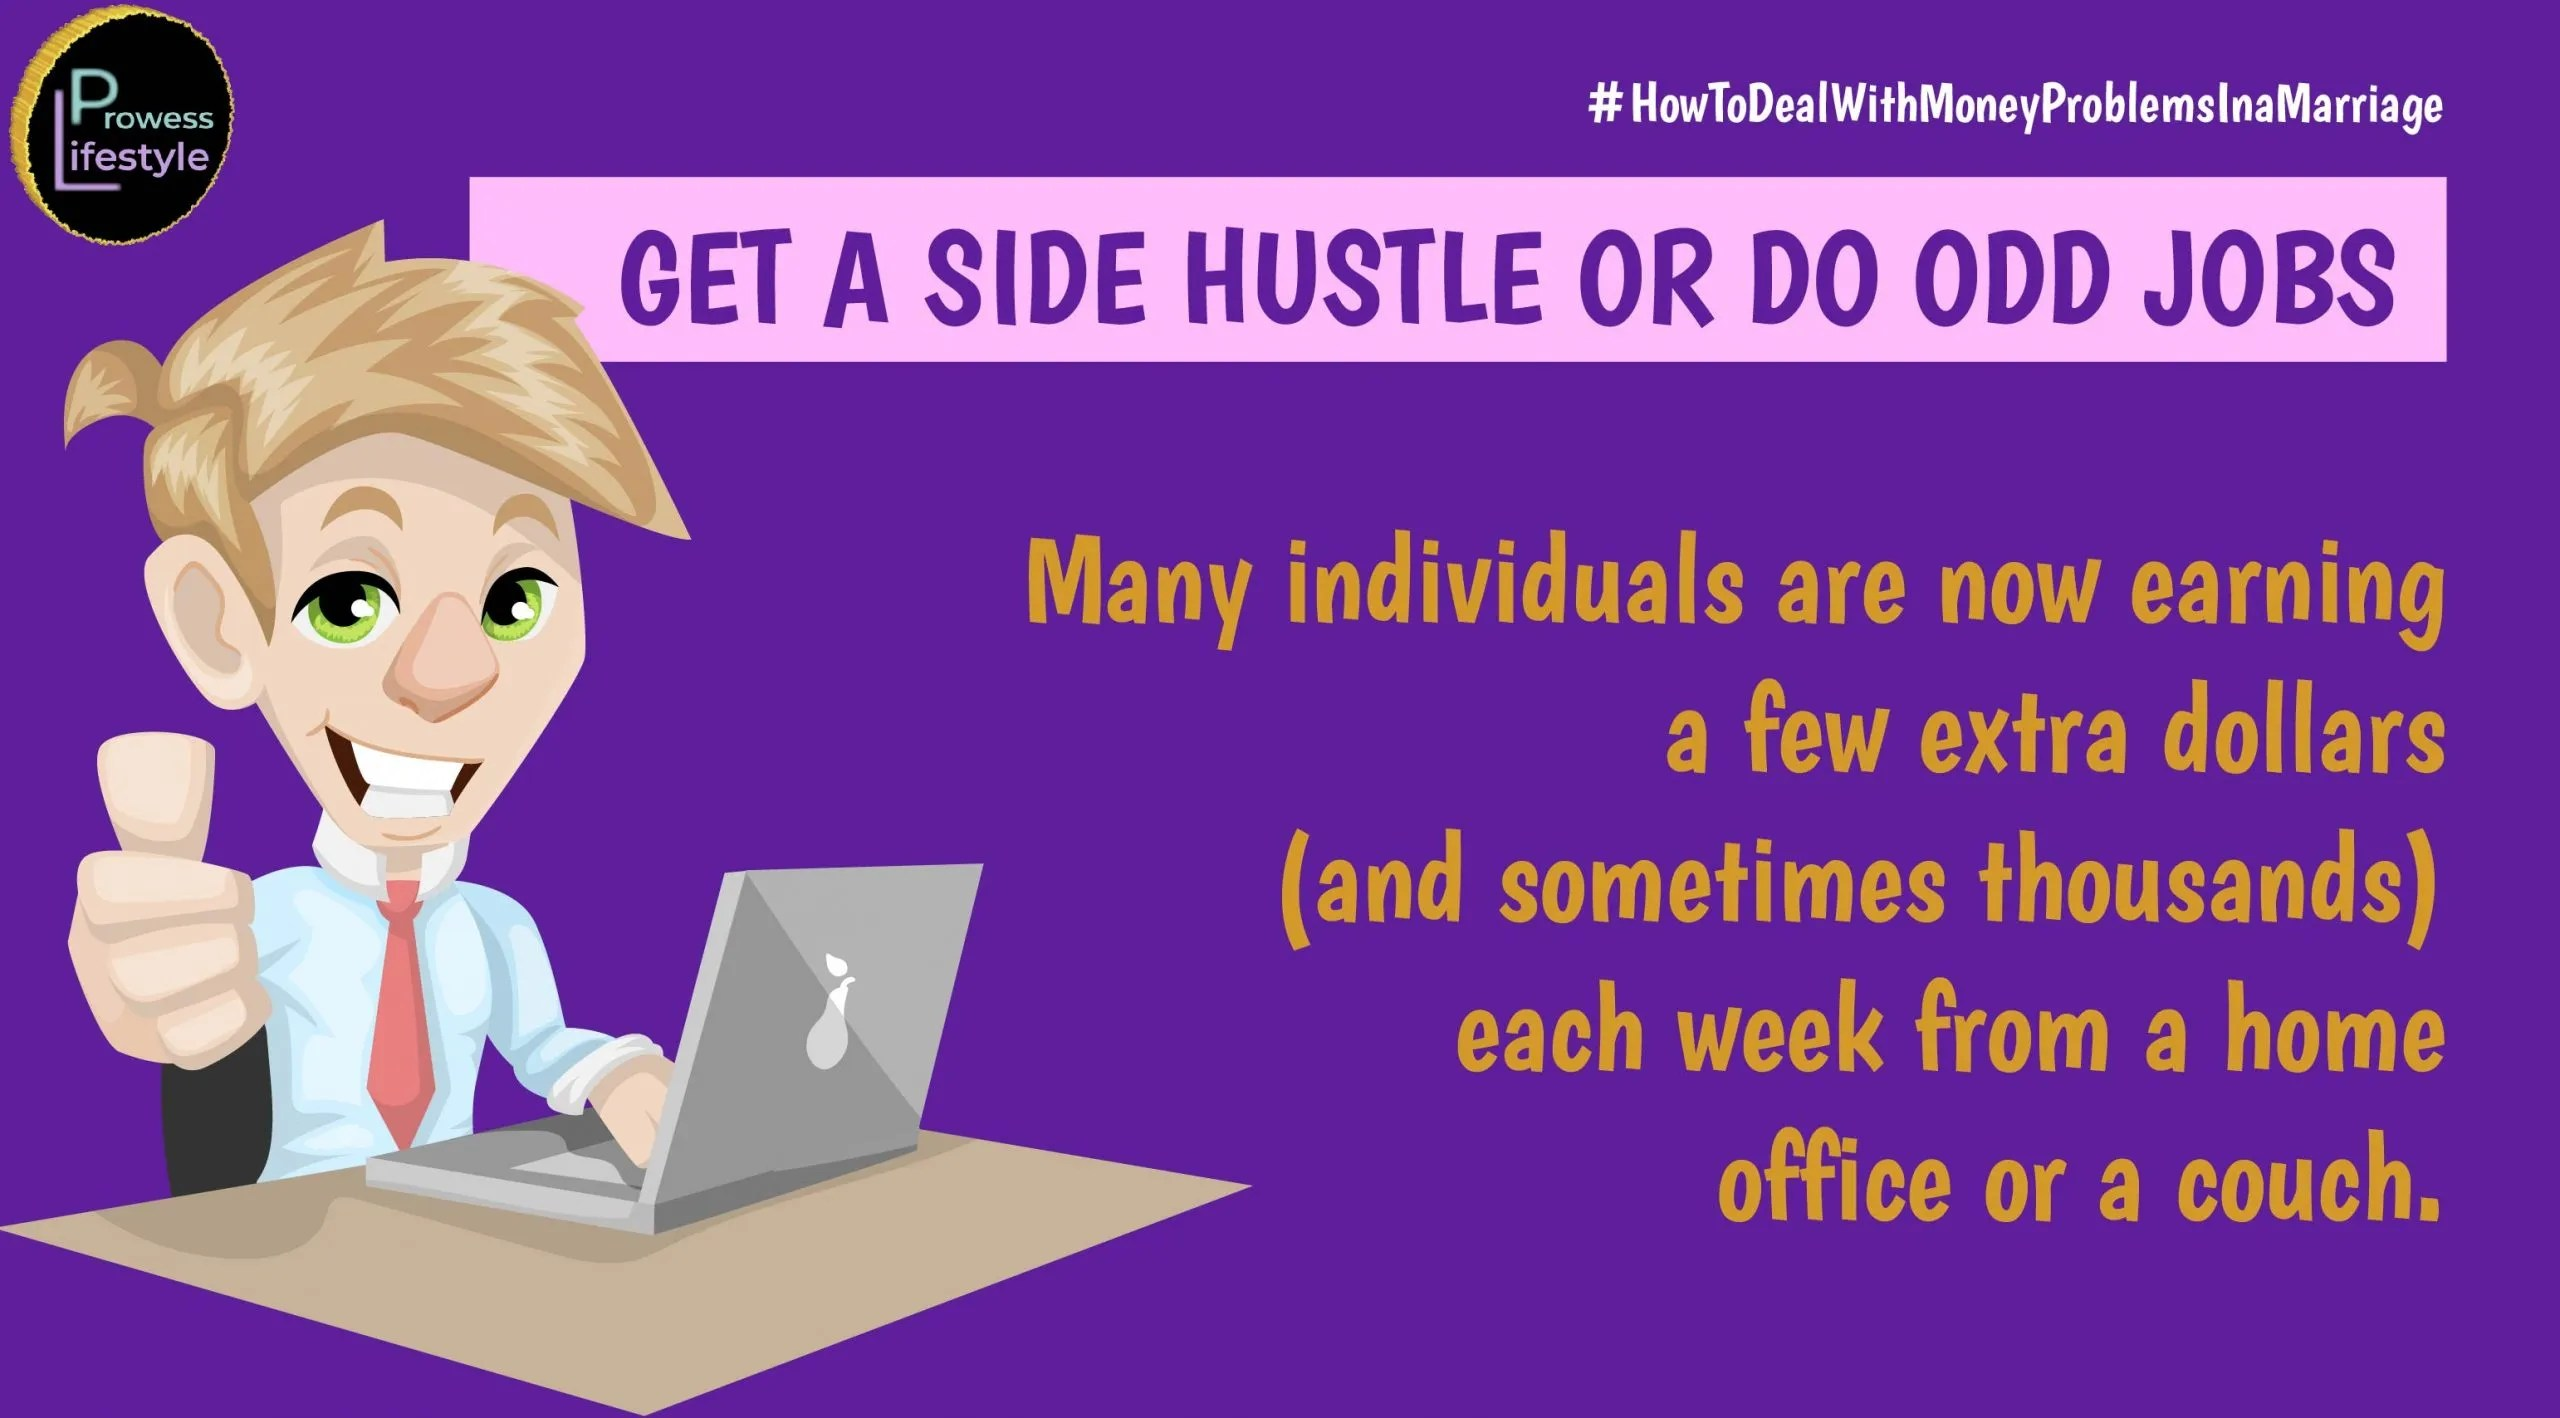 GET A SIDE HUSTLE OR DO ODD JOBS